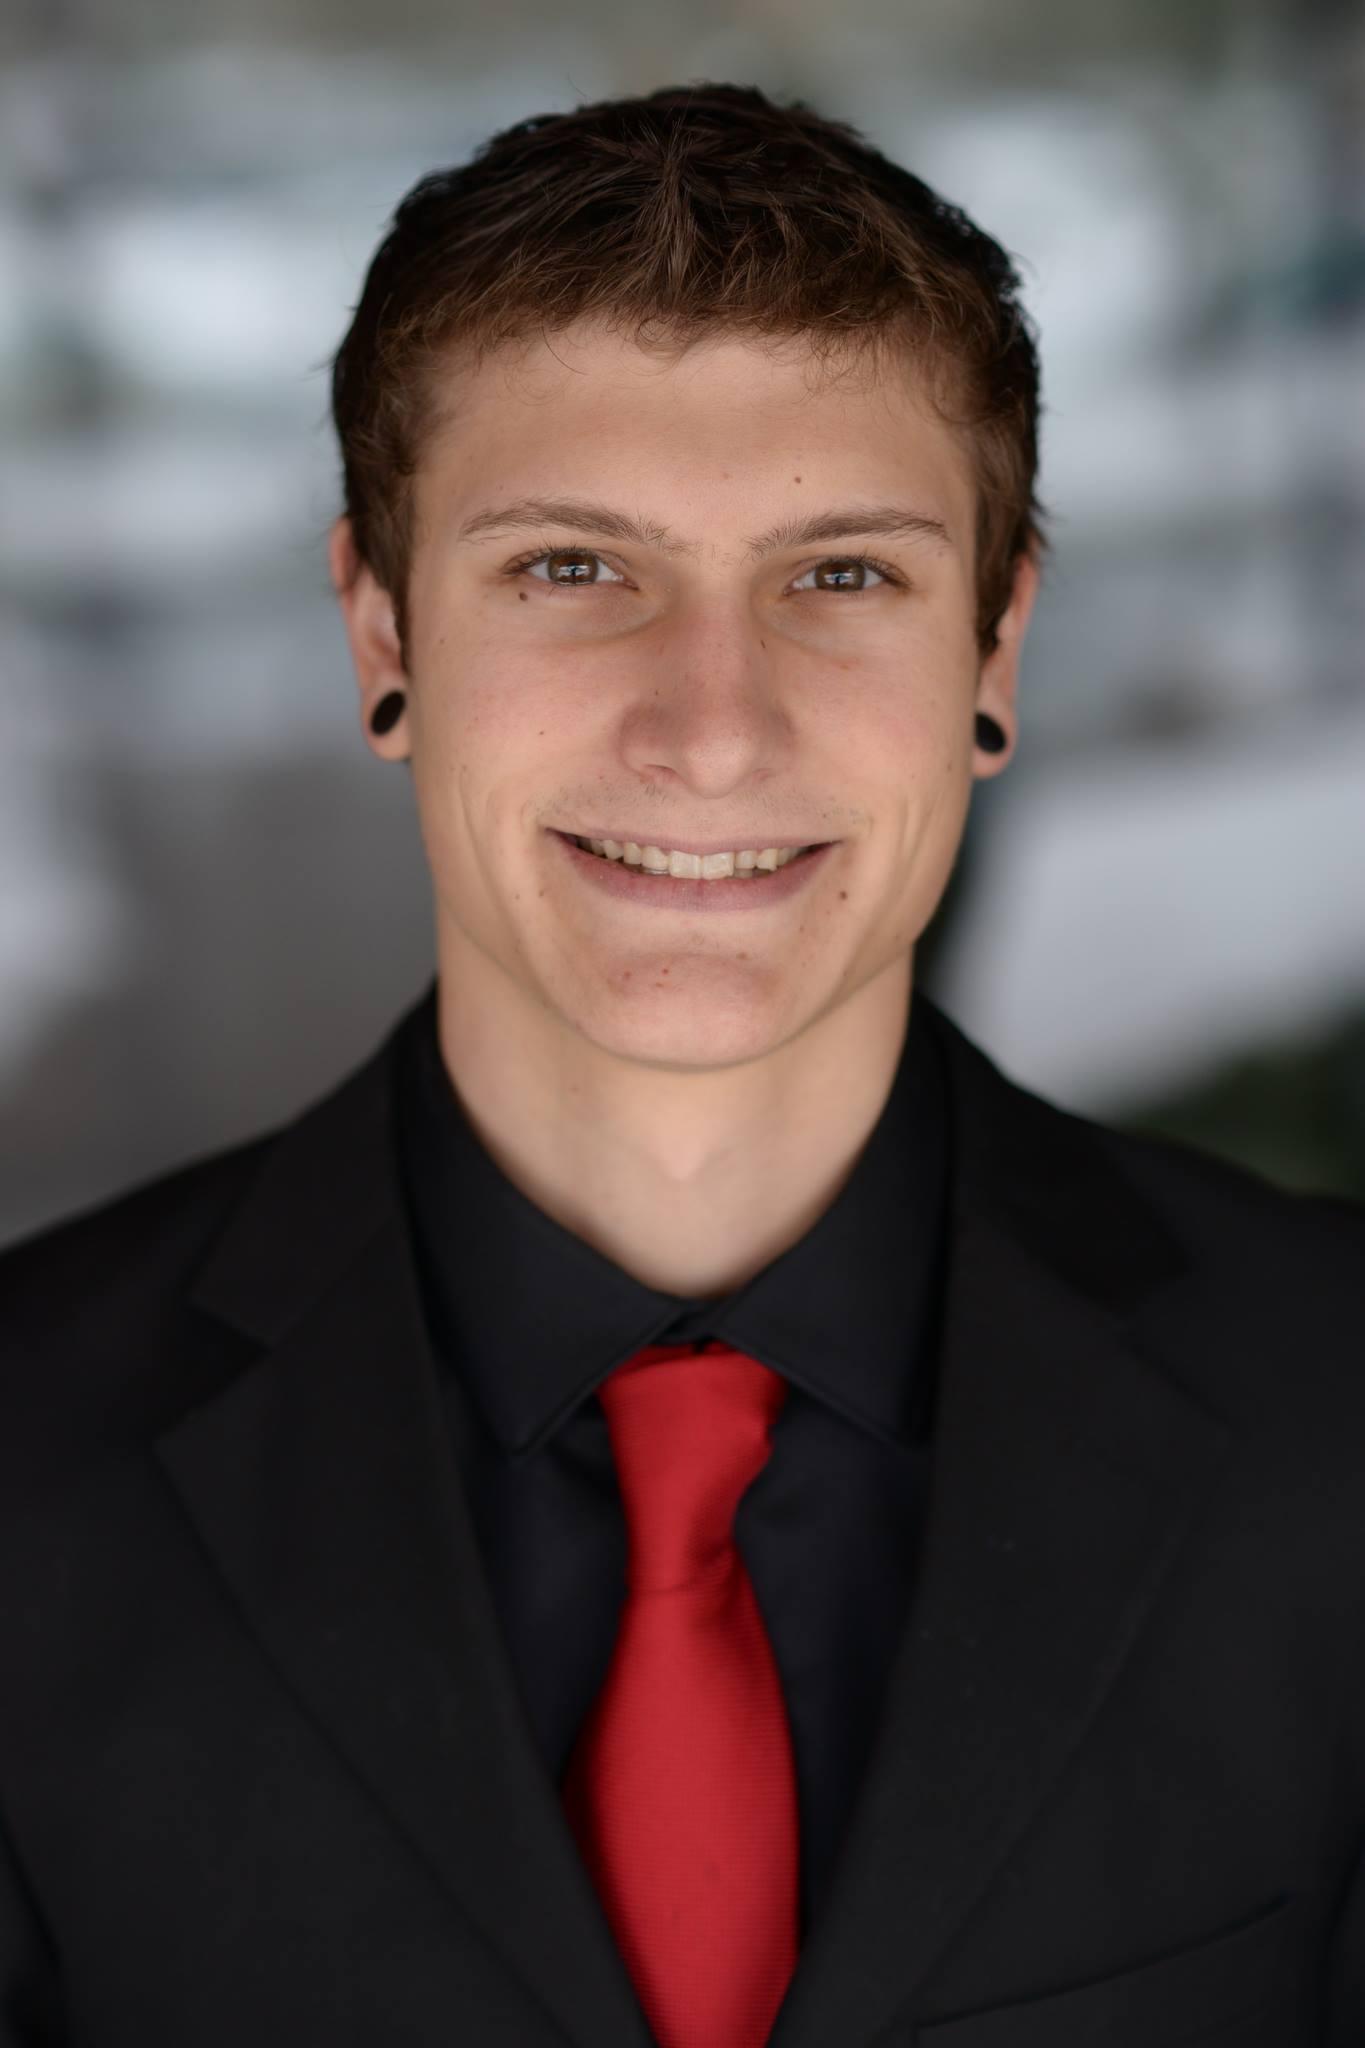 Odyssey Pursuit's Tim Burkhart named Cincinnati Chapter Chair of the Ohio Recruiters Association